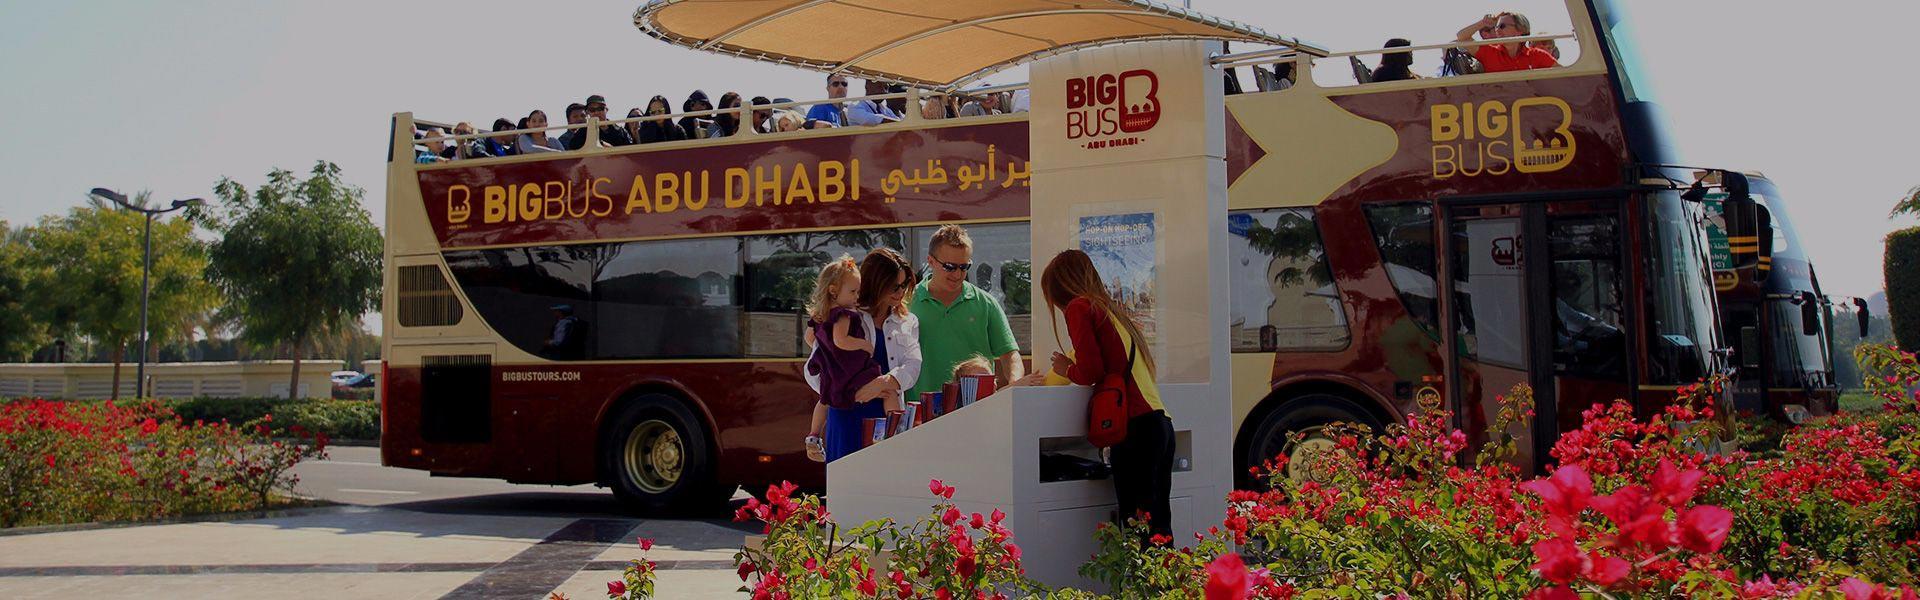 Bus und Personal in Abu Dhabi